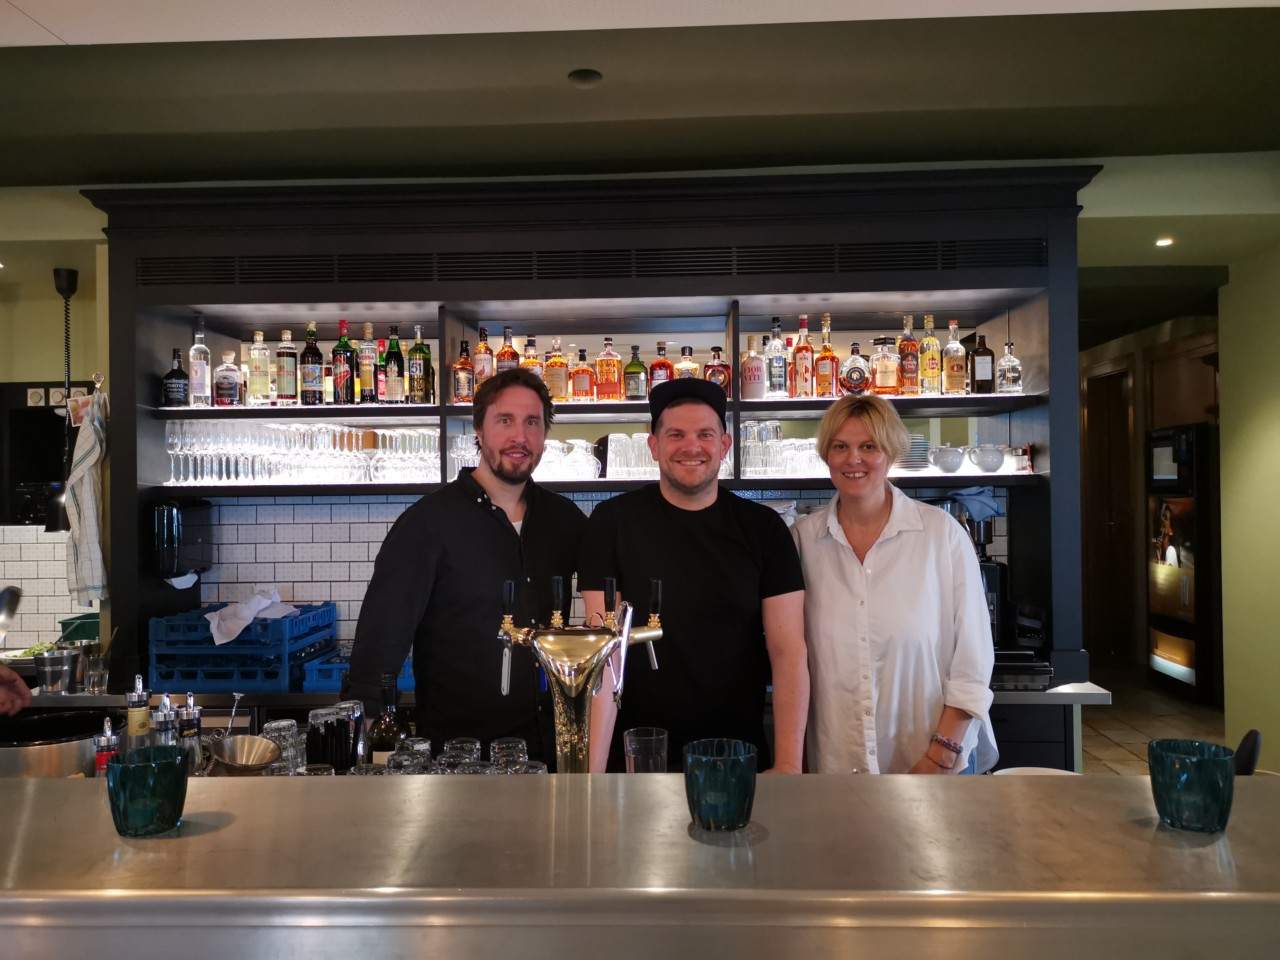 v.l.n.r.: Florian Bopst, René Müller, Céline Tschanz. Foto: Lunchgate/Max